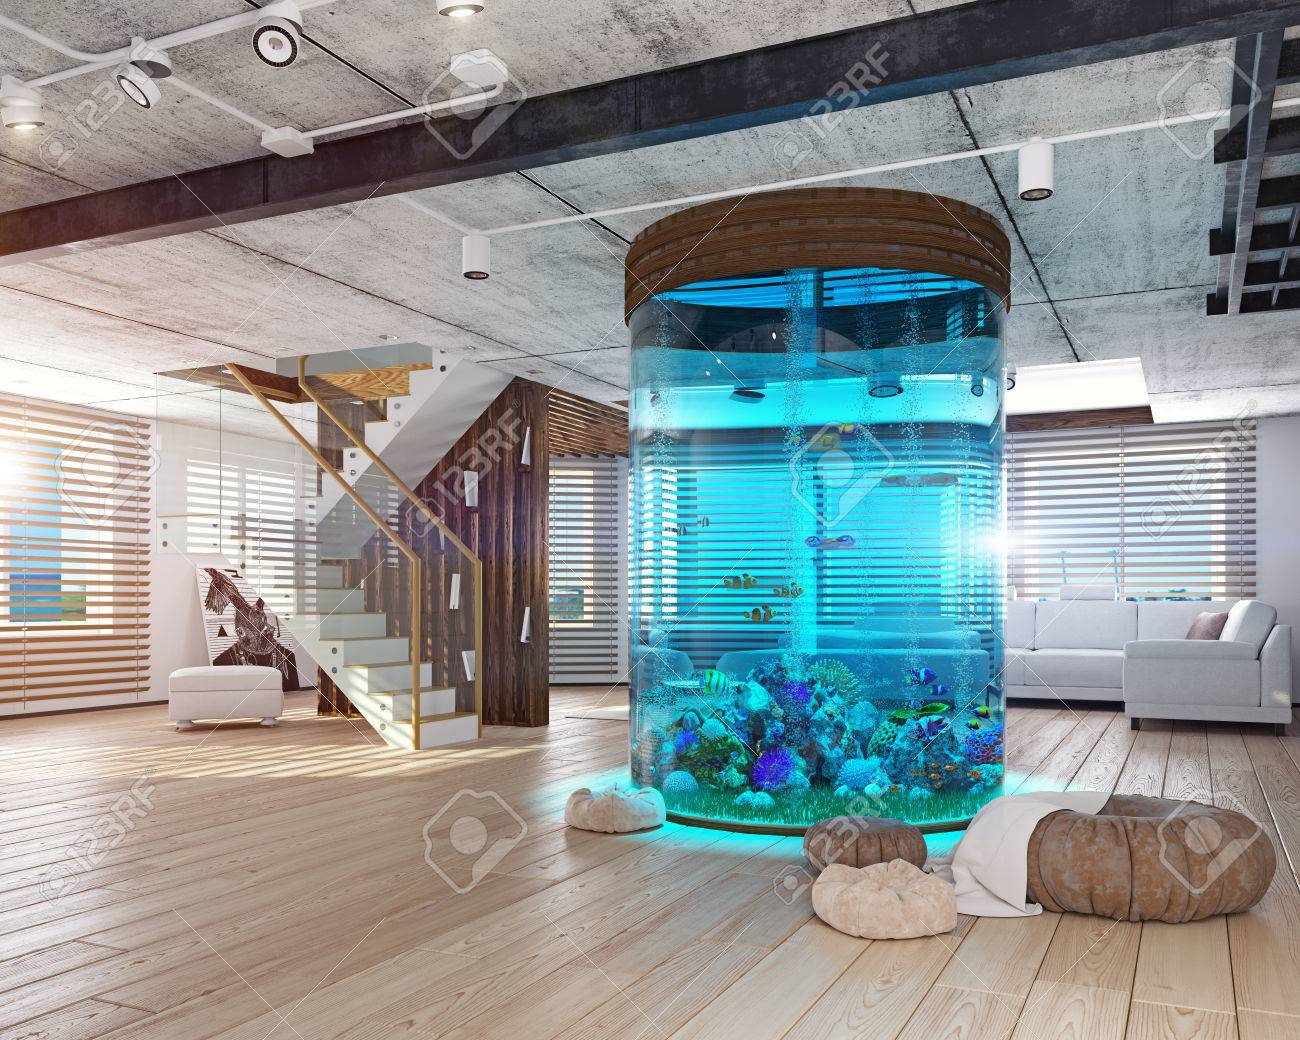 The modern loft interior with aquarium d concept stock photo